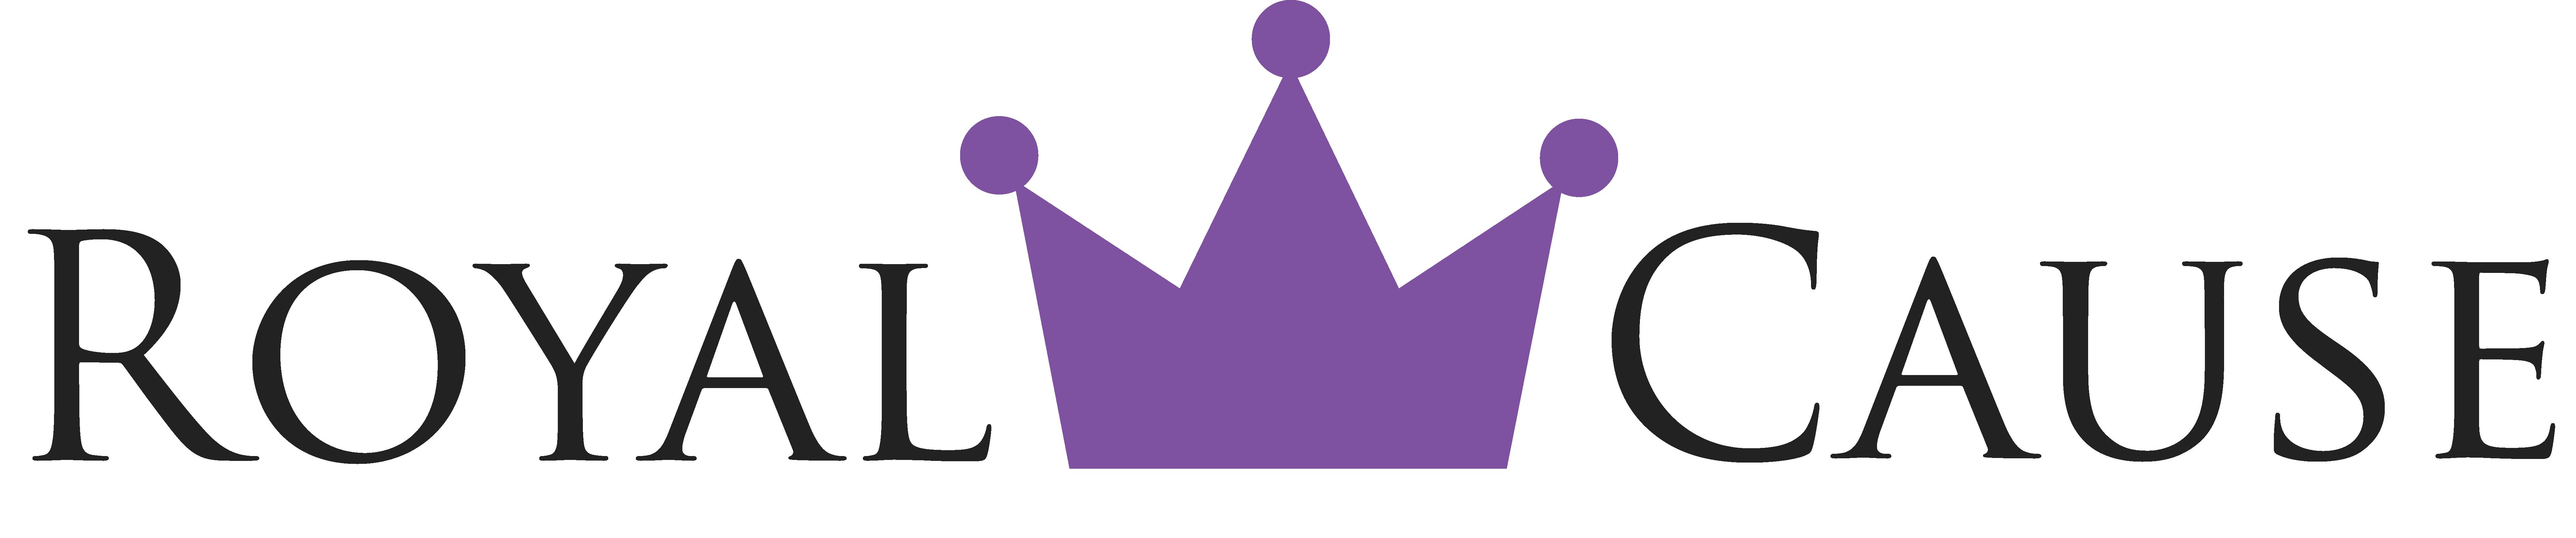 royalCauseLogo